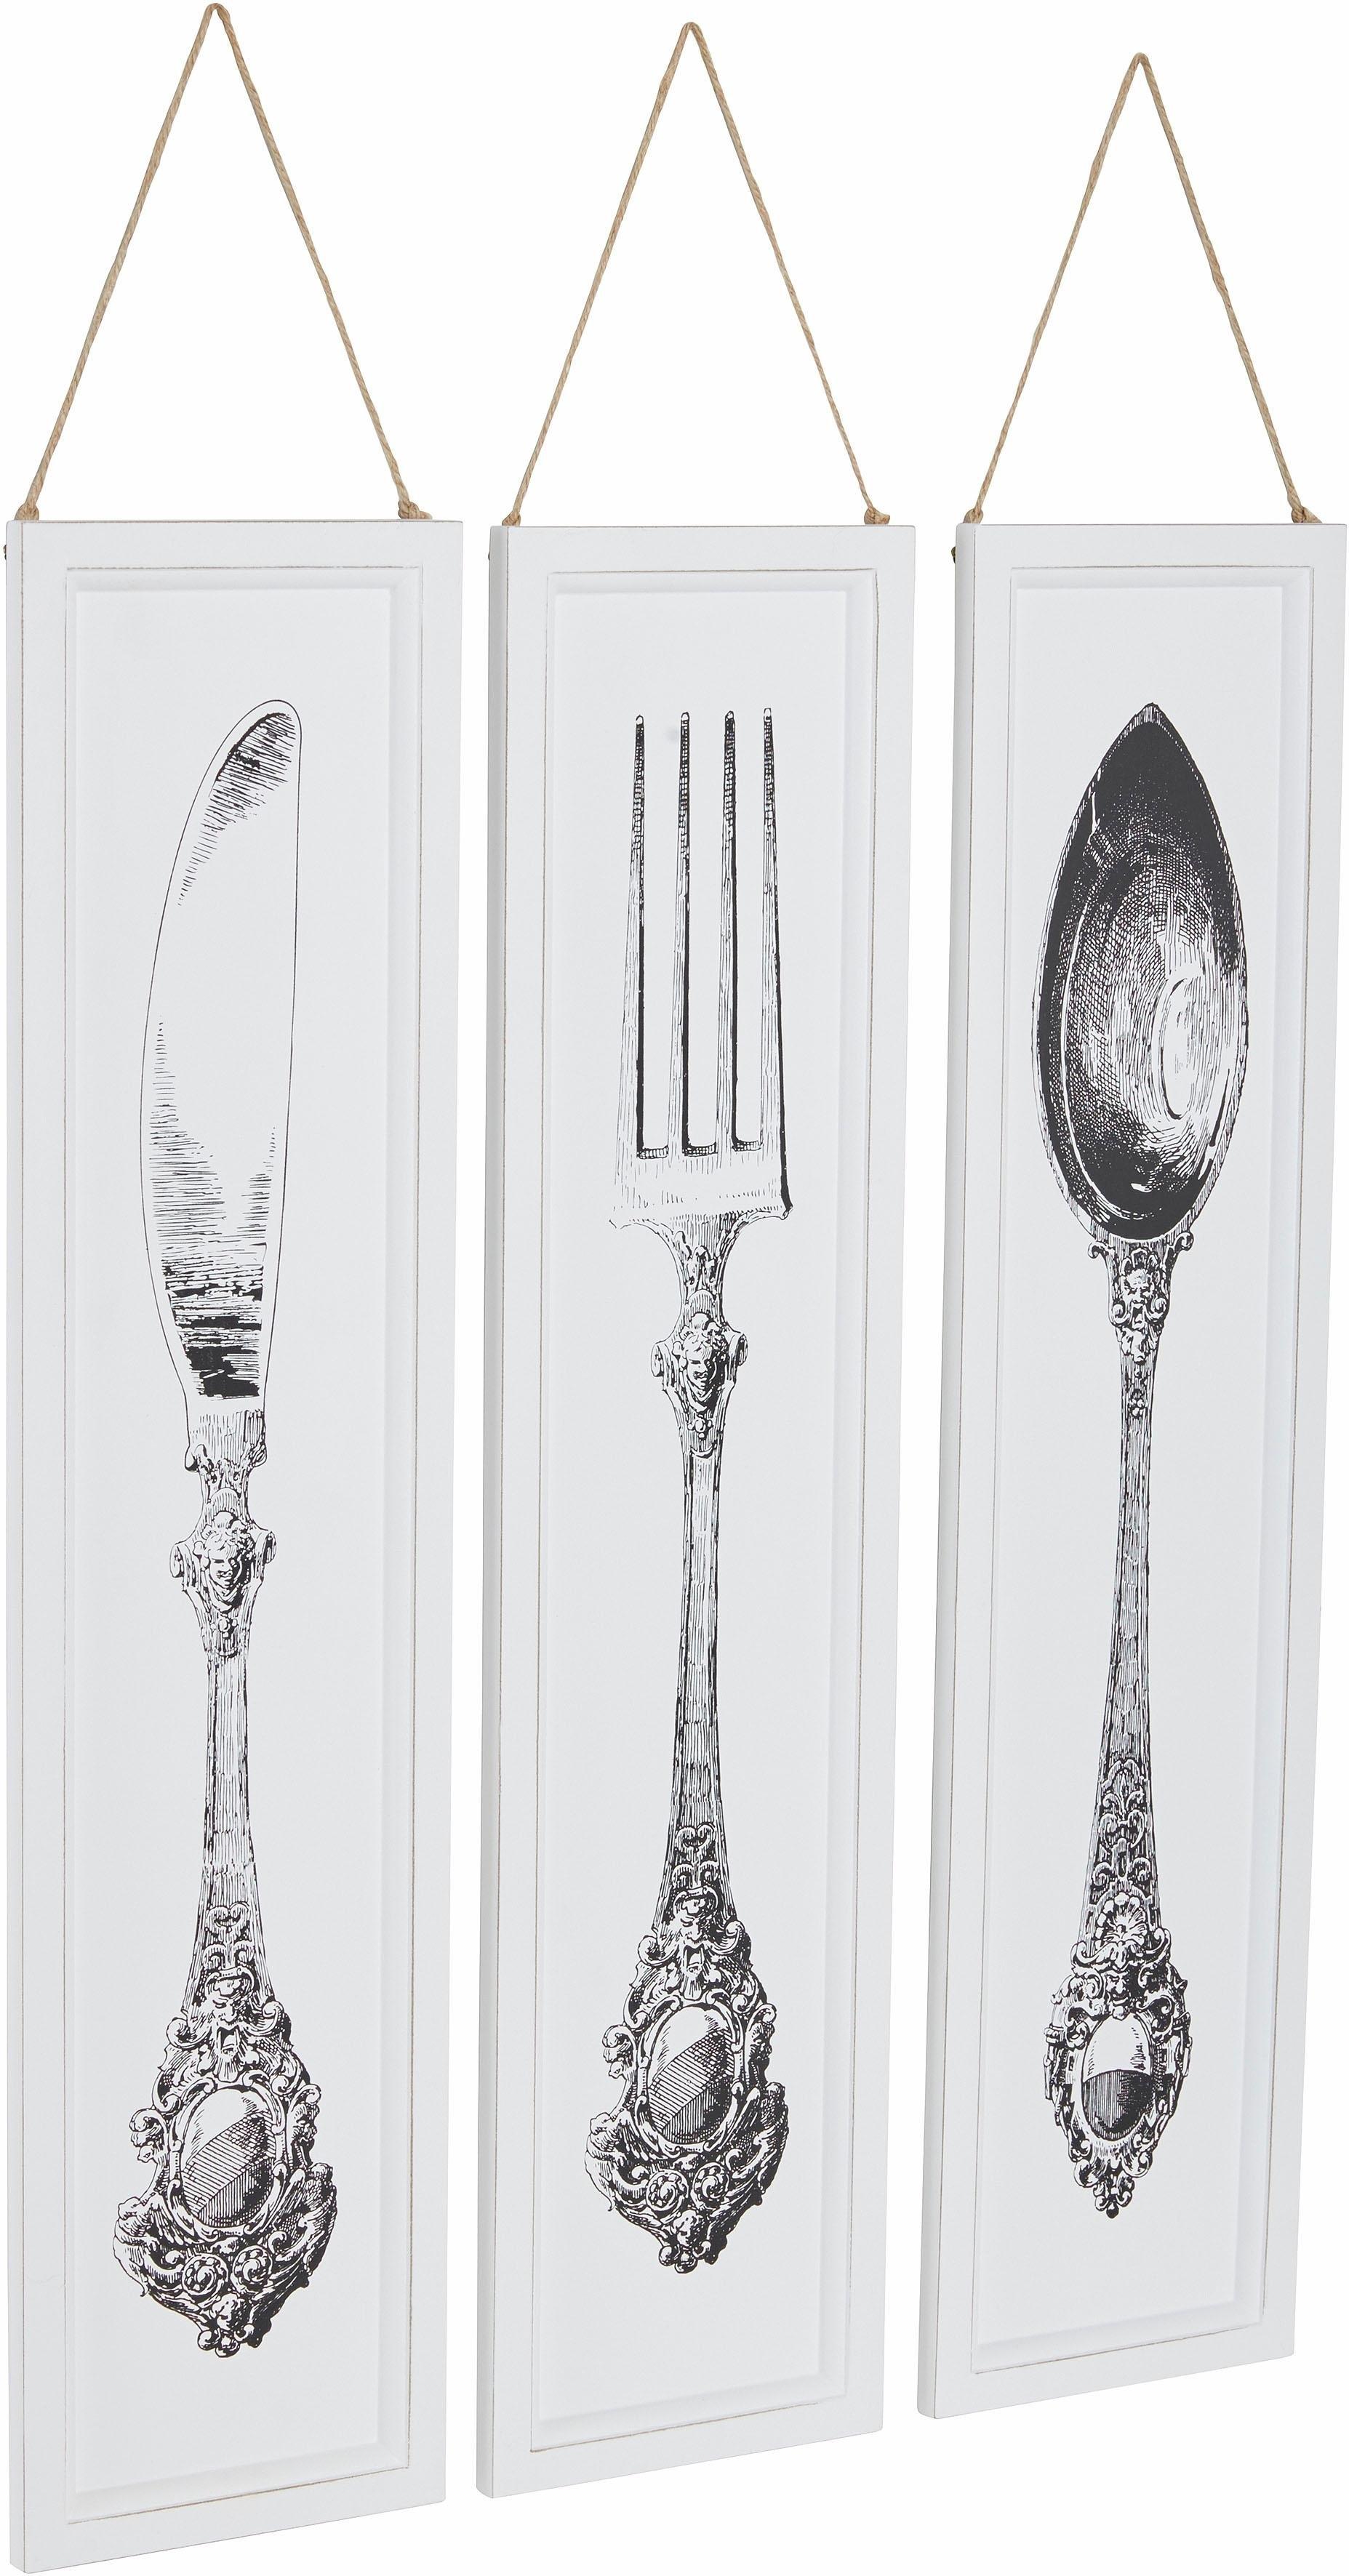 Wanddecoratie Bestek Groot.Home Affaire Artprint Bestek 3 Dlg Makkelijk Besteld Otto